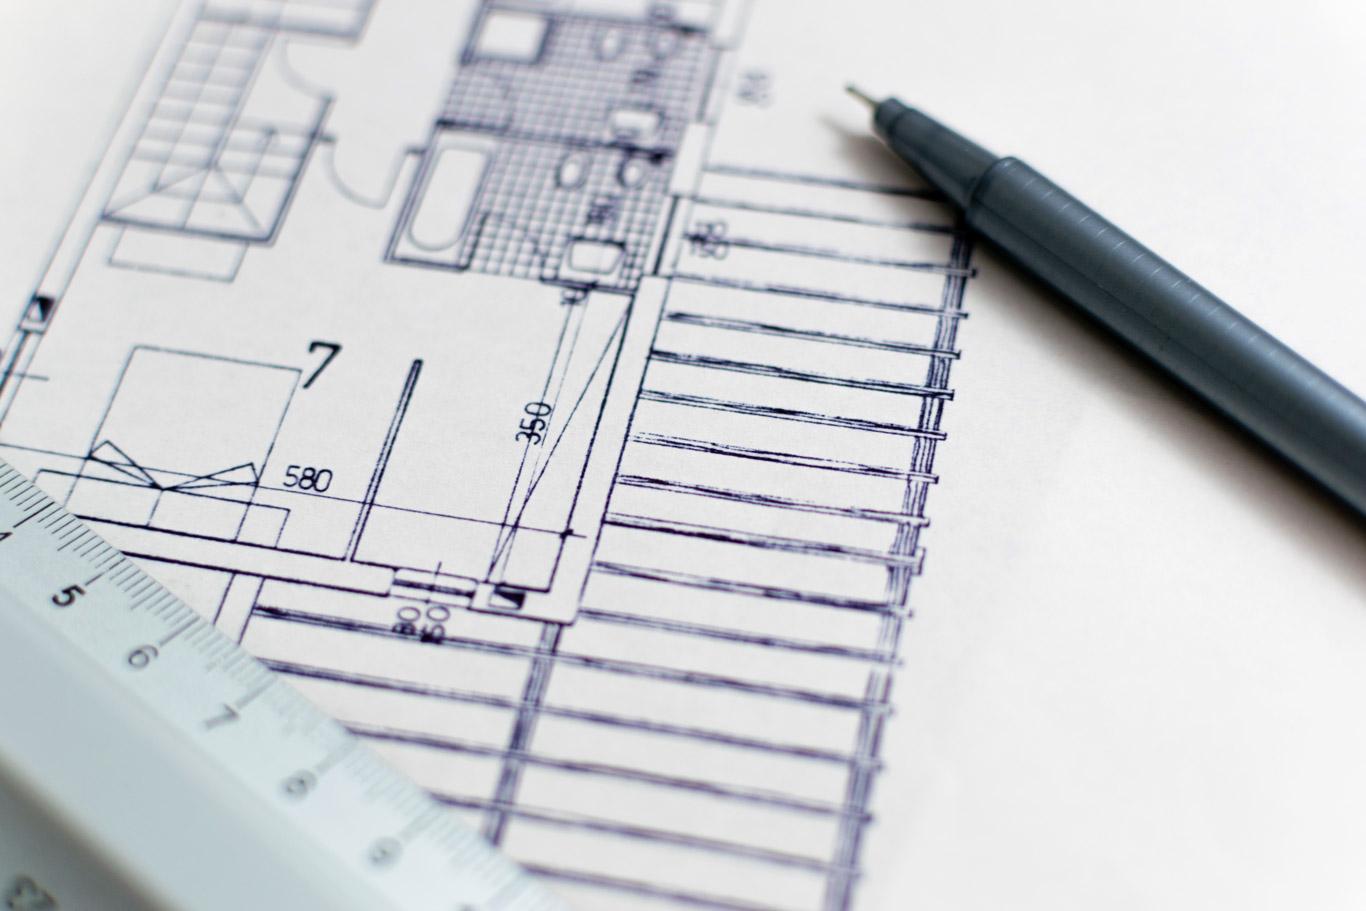 2) Design - • Floorplans• Permit Drawings• Construction Budget• Permit Applications• Timeline Estimate• Adjustments to Suit Budget & Needs